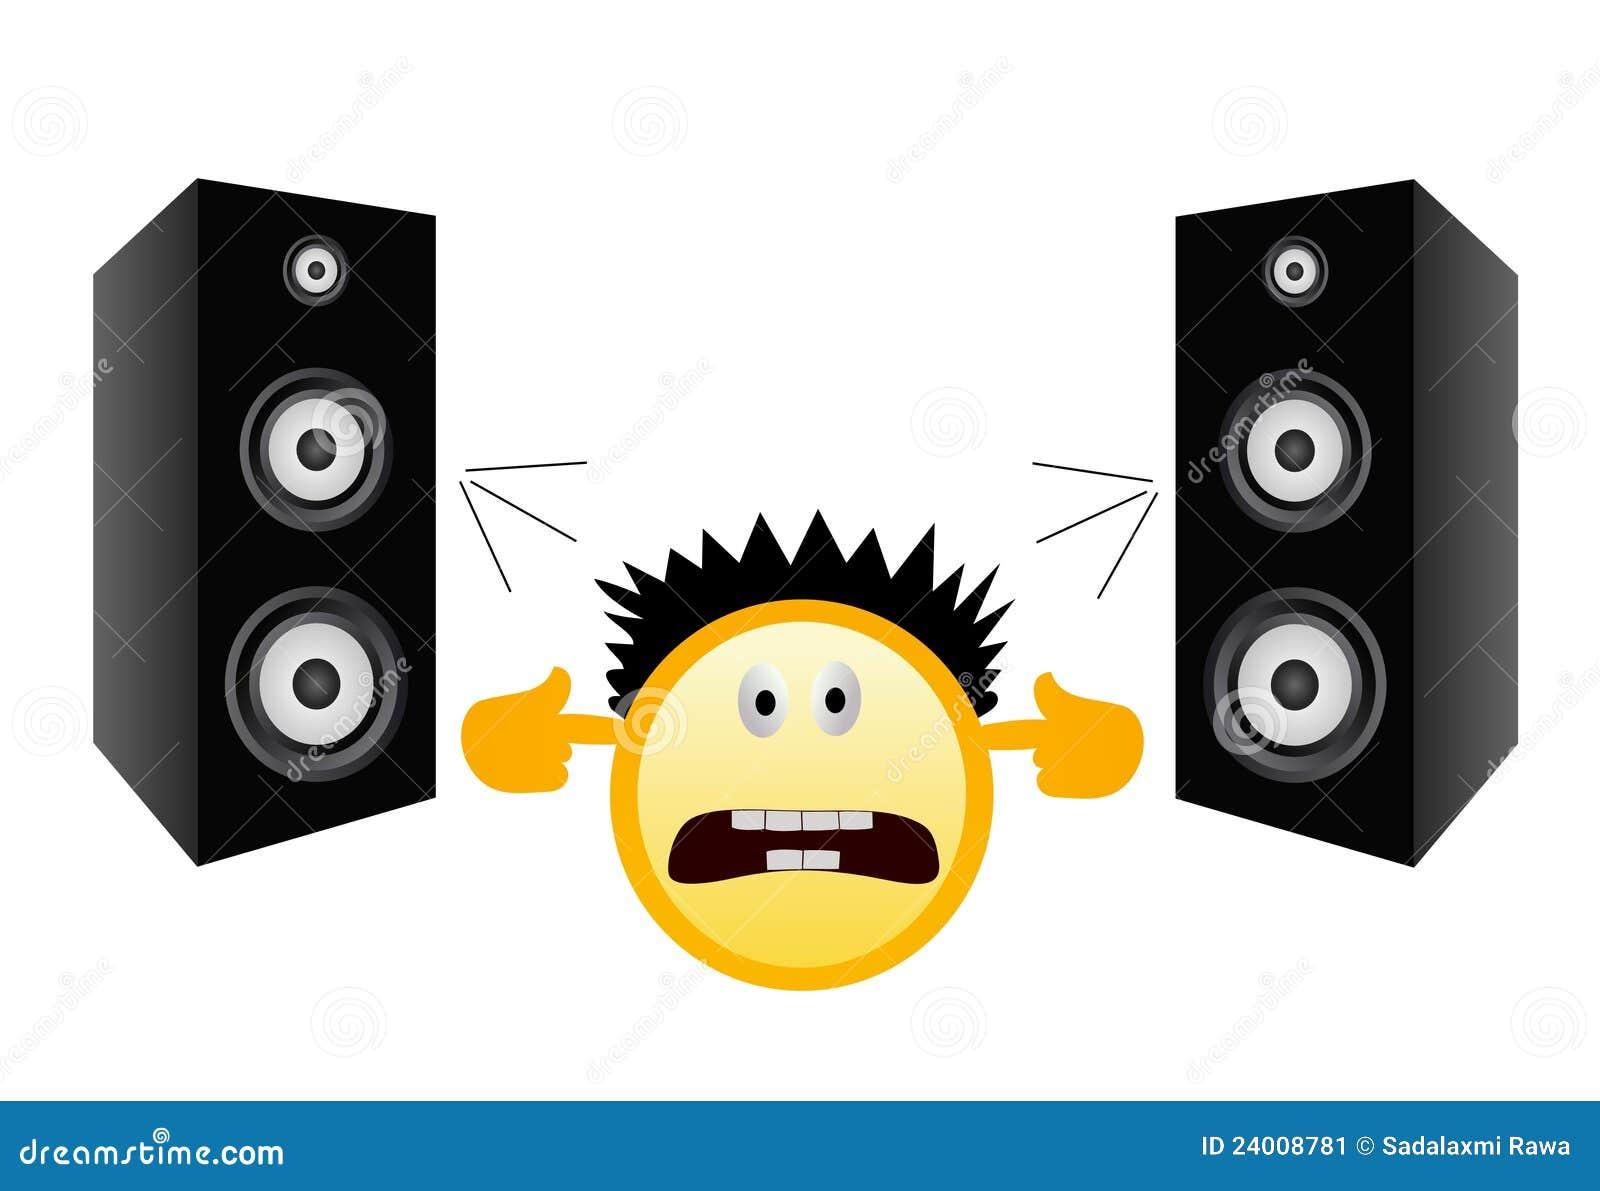 No Loud Music Stock Image - Image: 24008781